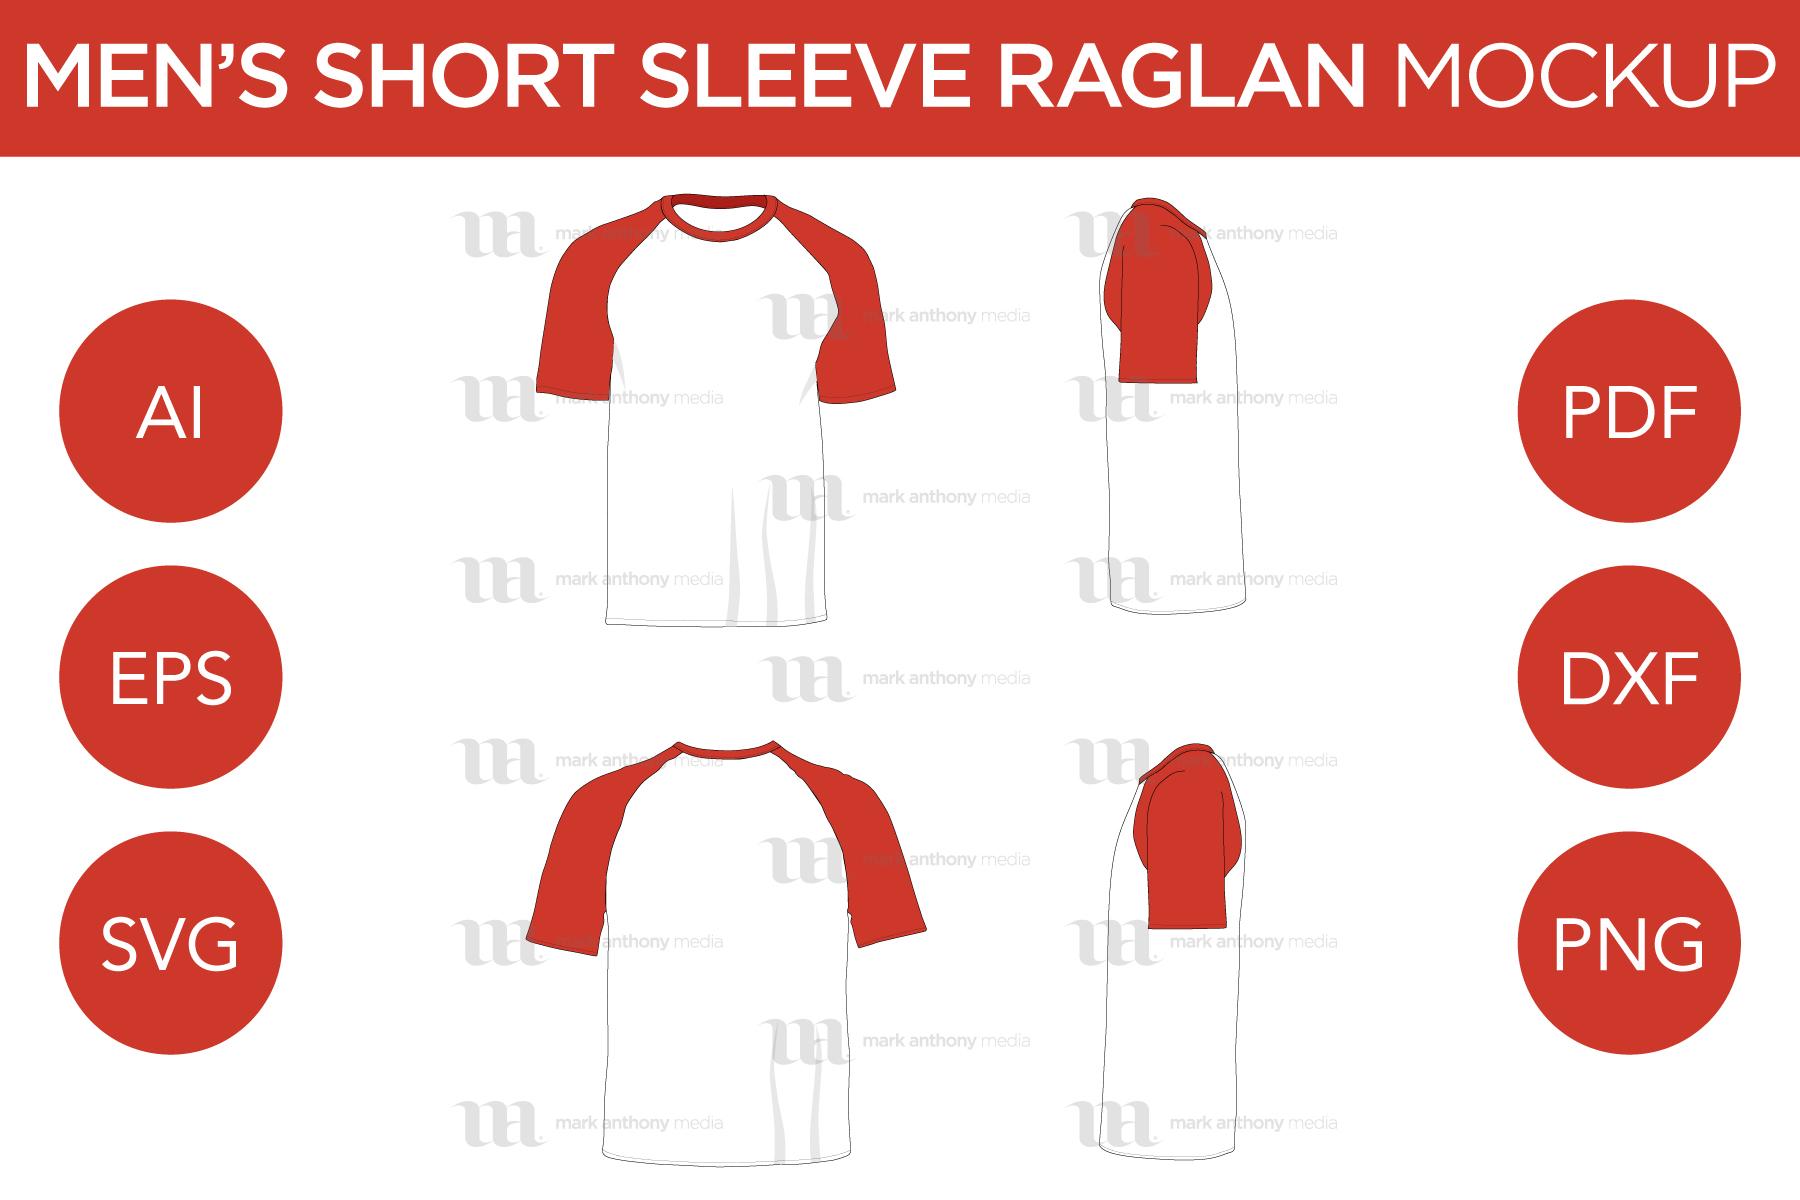 Men's Short Sleeve Raglan Mockup and Template